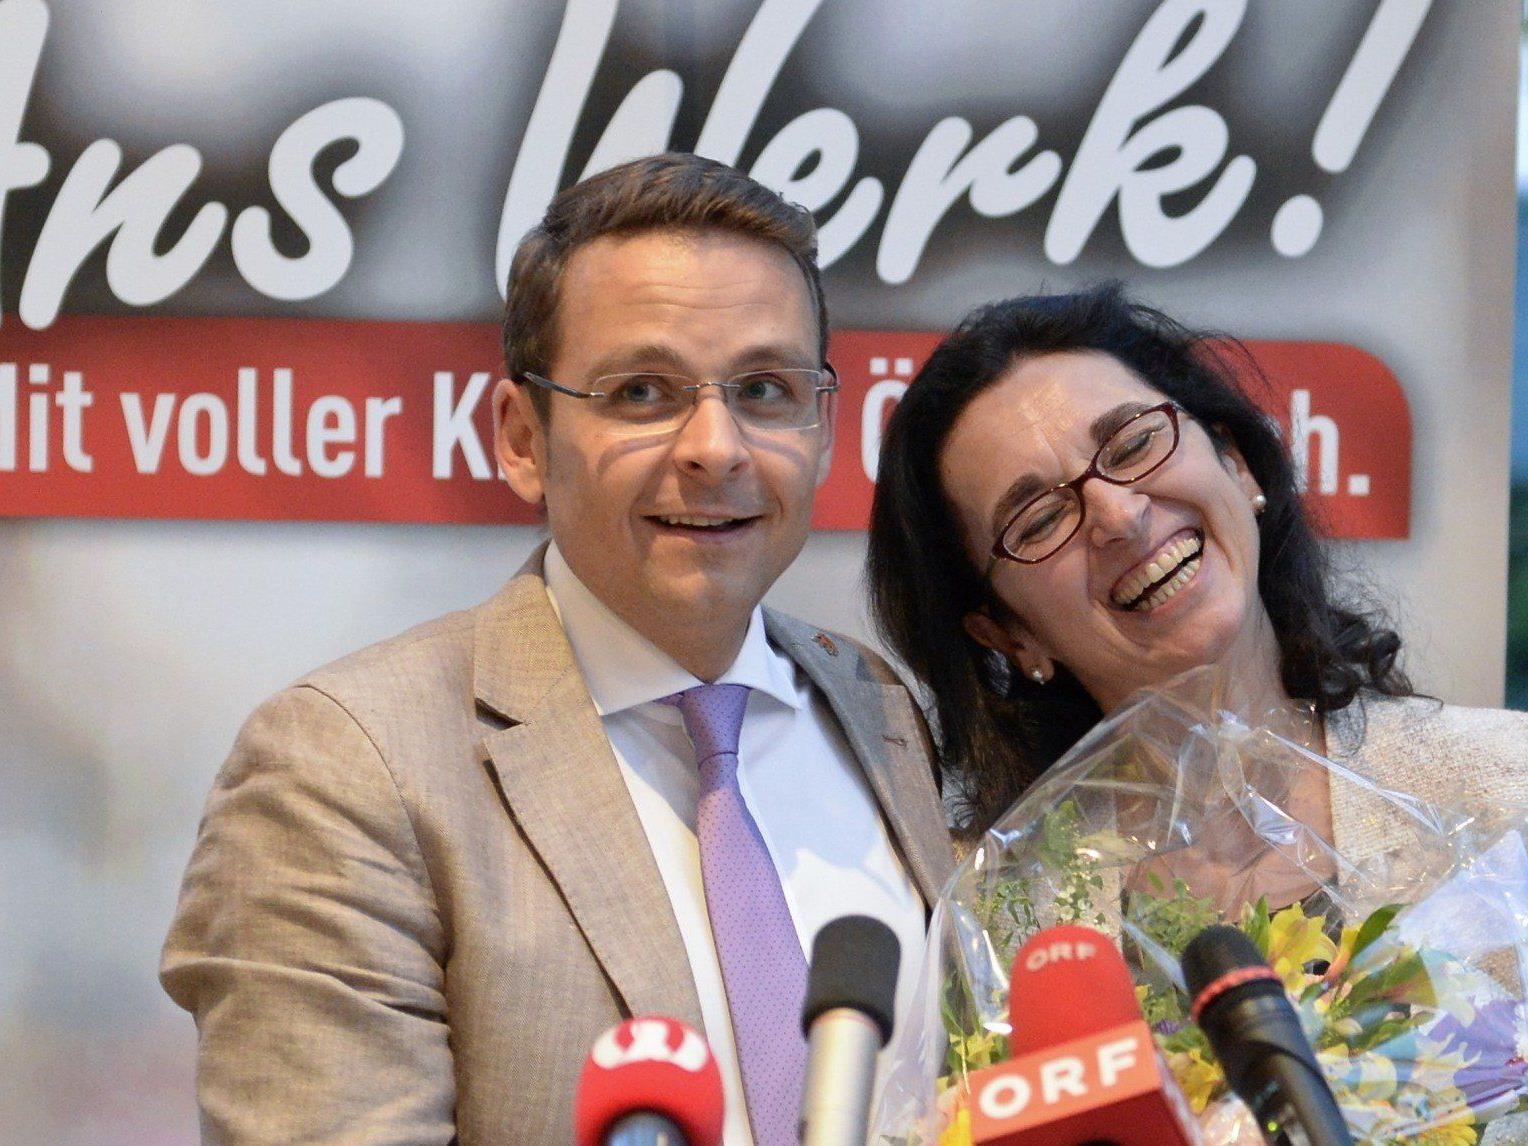 EU-Wahl: Am Montag wurde der Intensivwahlkampf des BZÖ eröffnet.